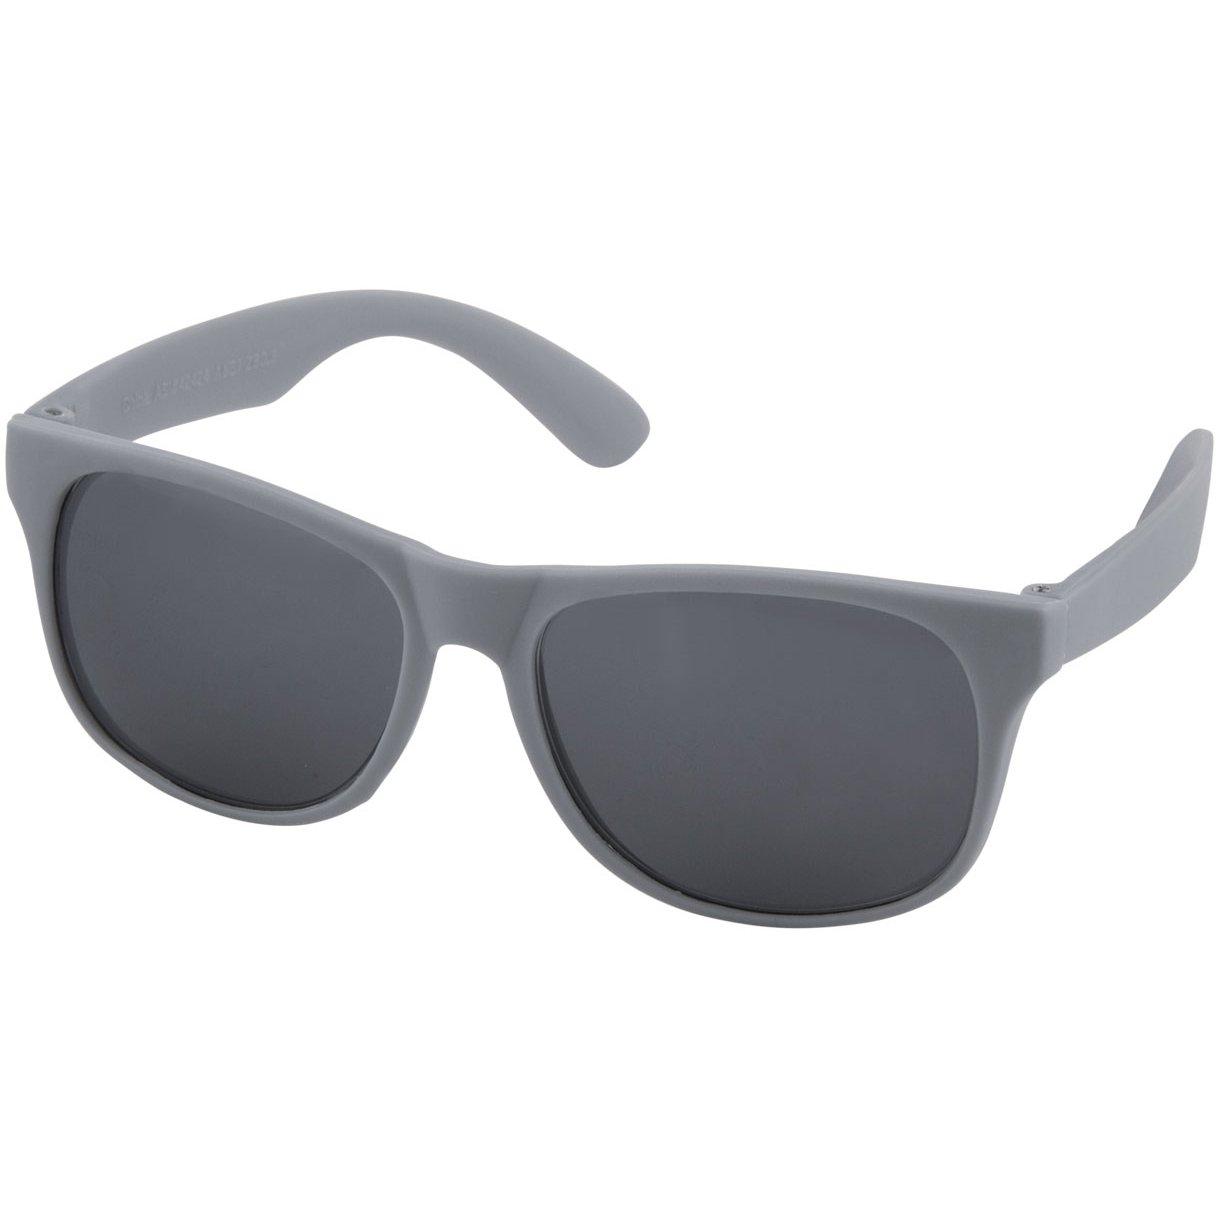 Bullet Retro Solid sunglasses